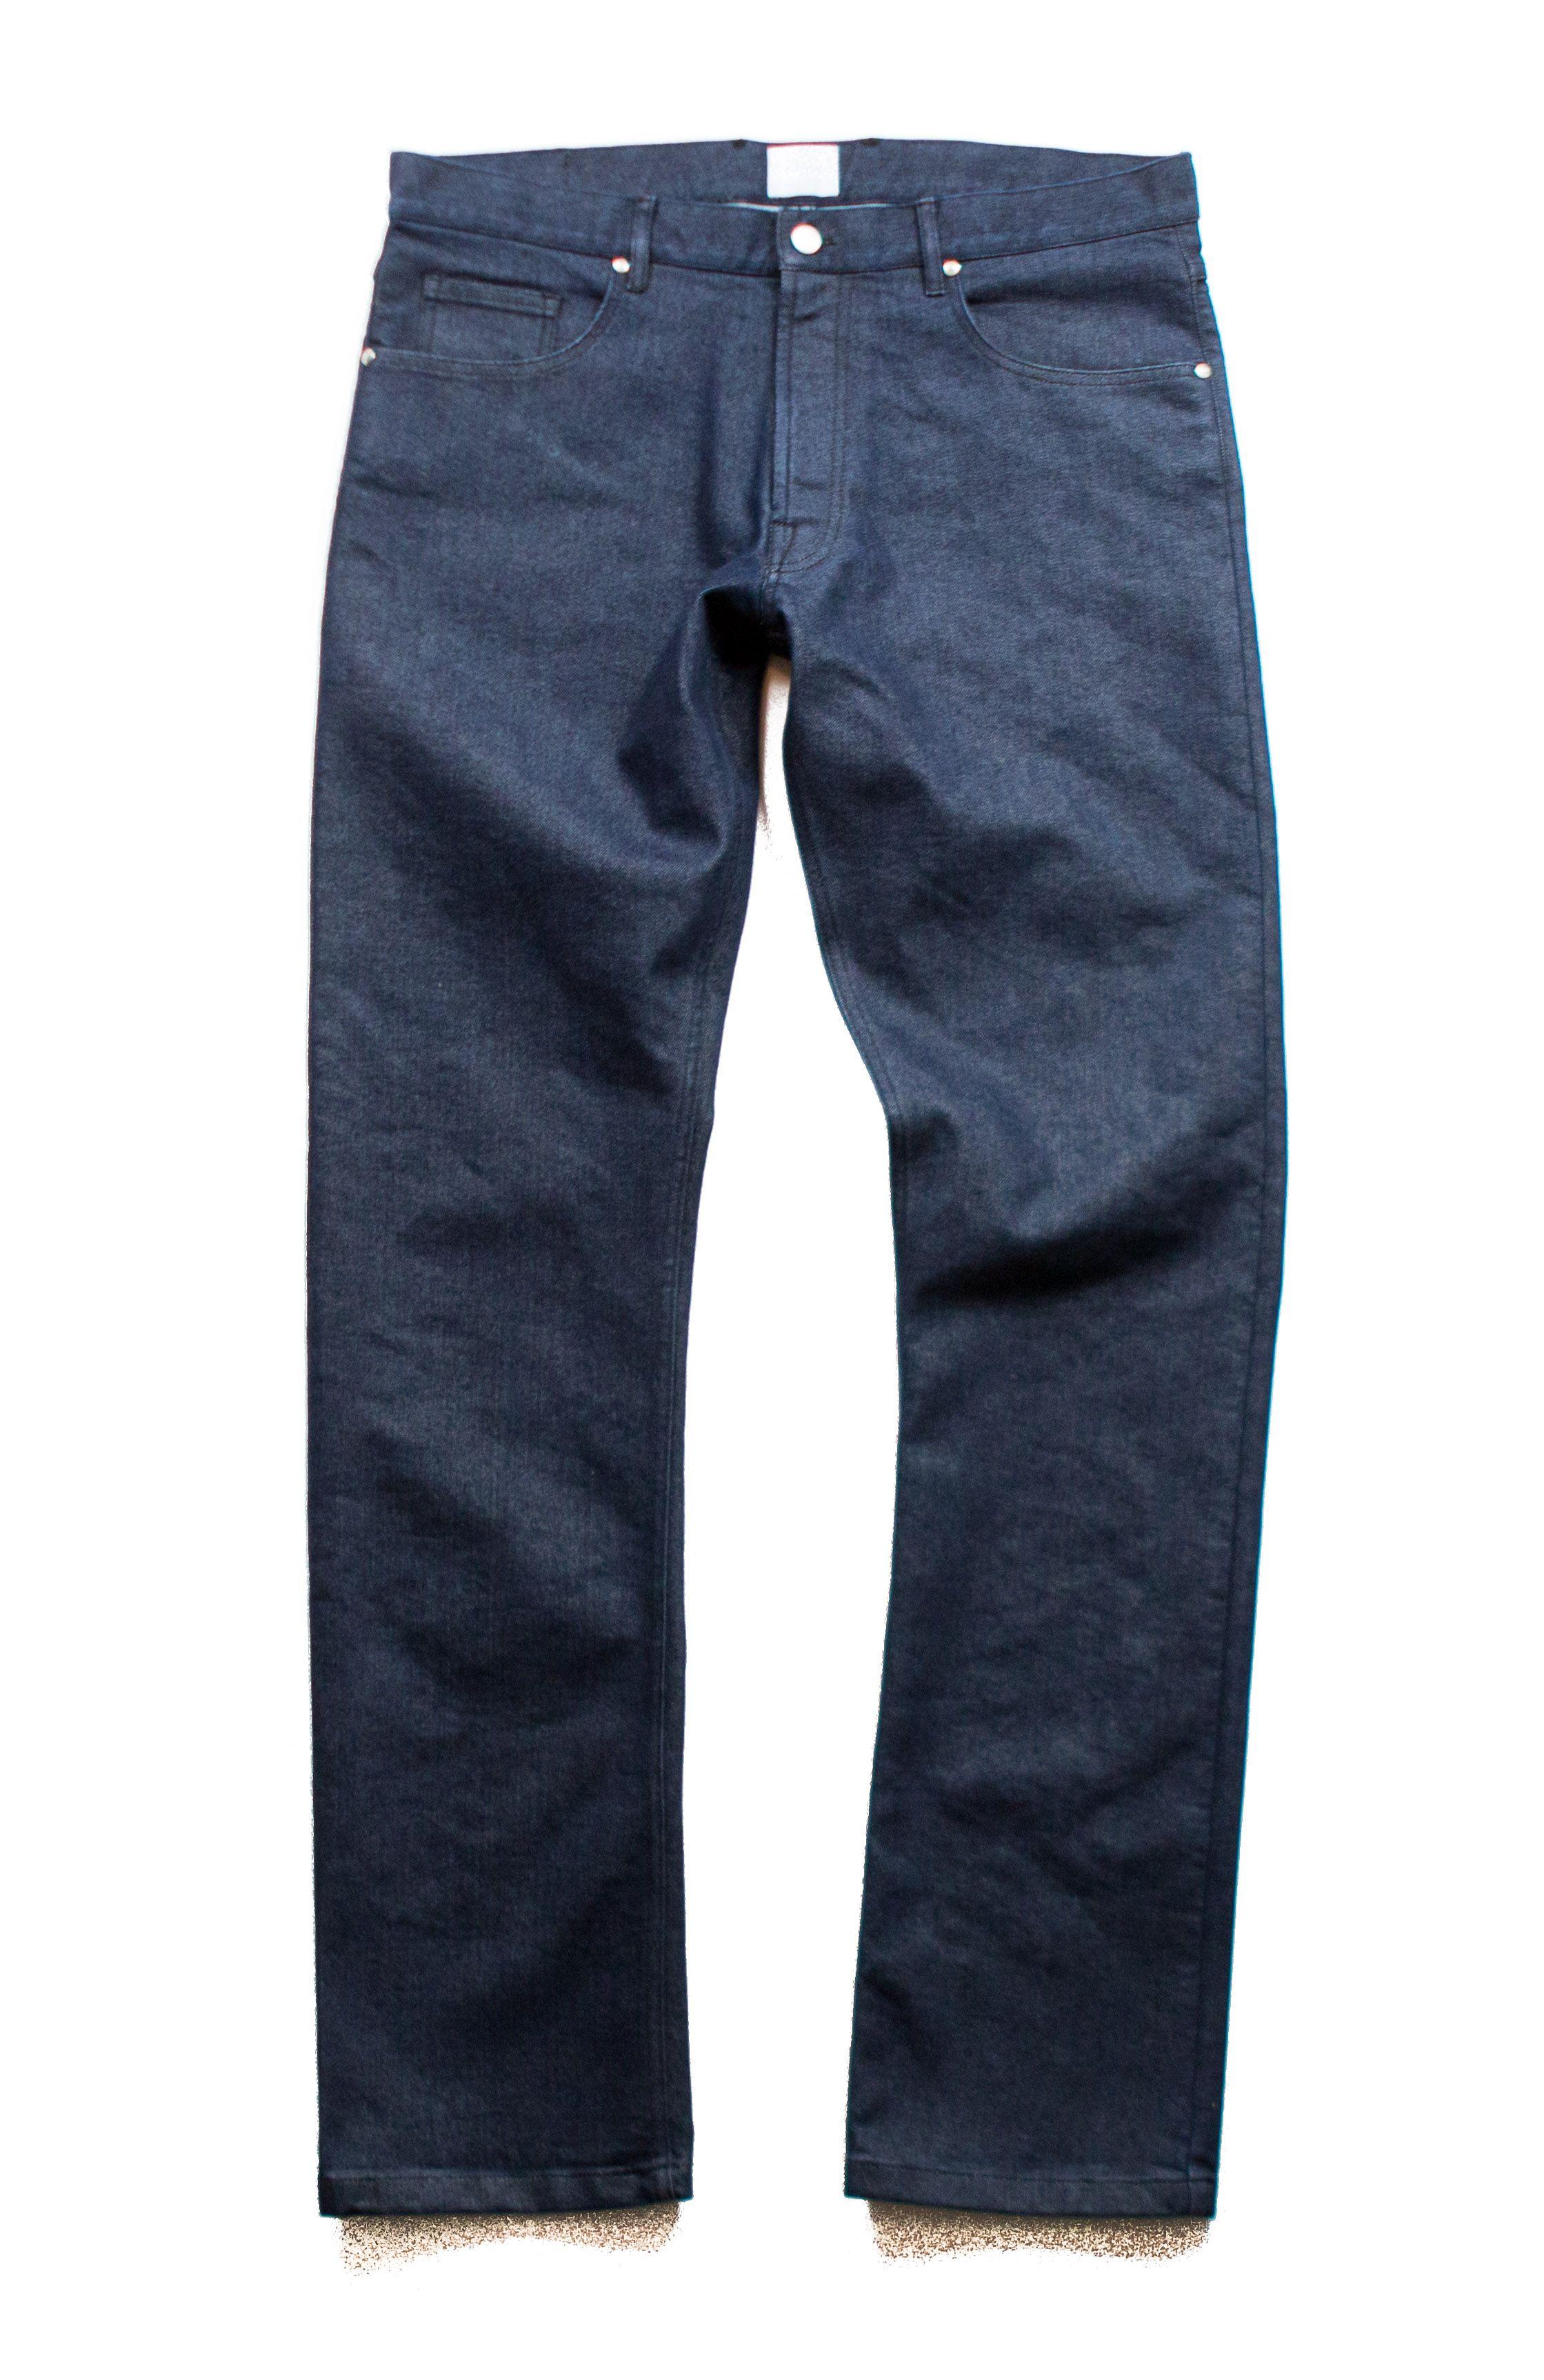 Proof ny blueprint denim jeans cordura nylon blended with cotton proof ny blueprint denim jeans cordura nylon blended with cotton for high tech performance and durability malvernweather Image collections